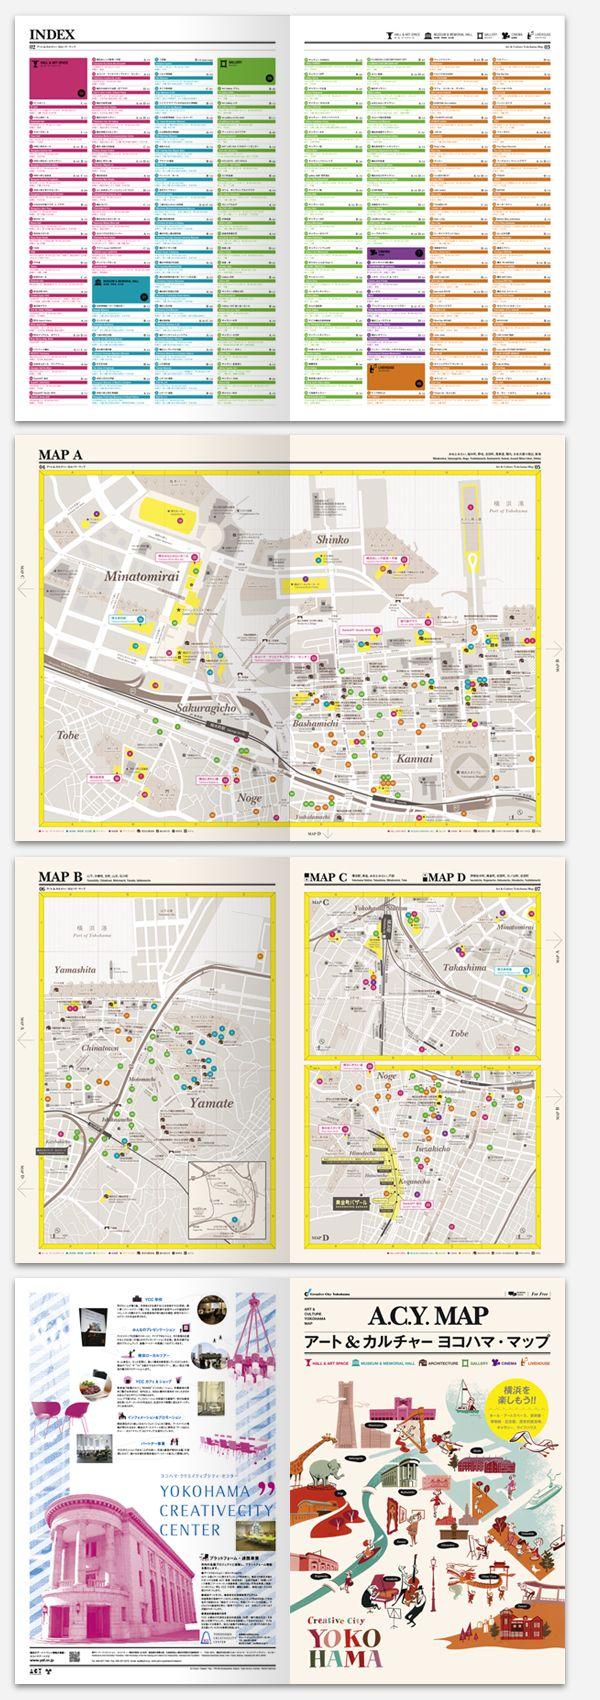 Yokohama Creative City map and guide